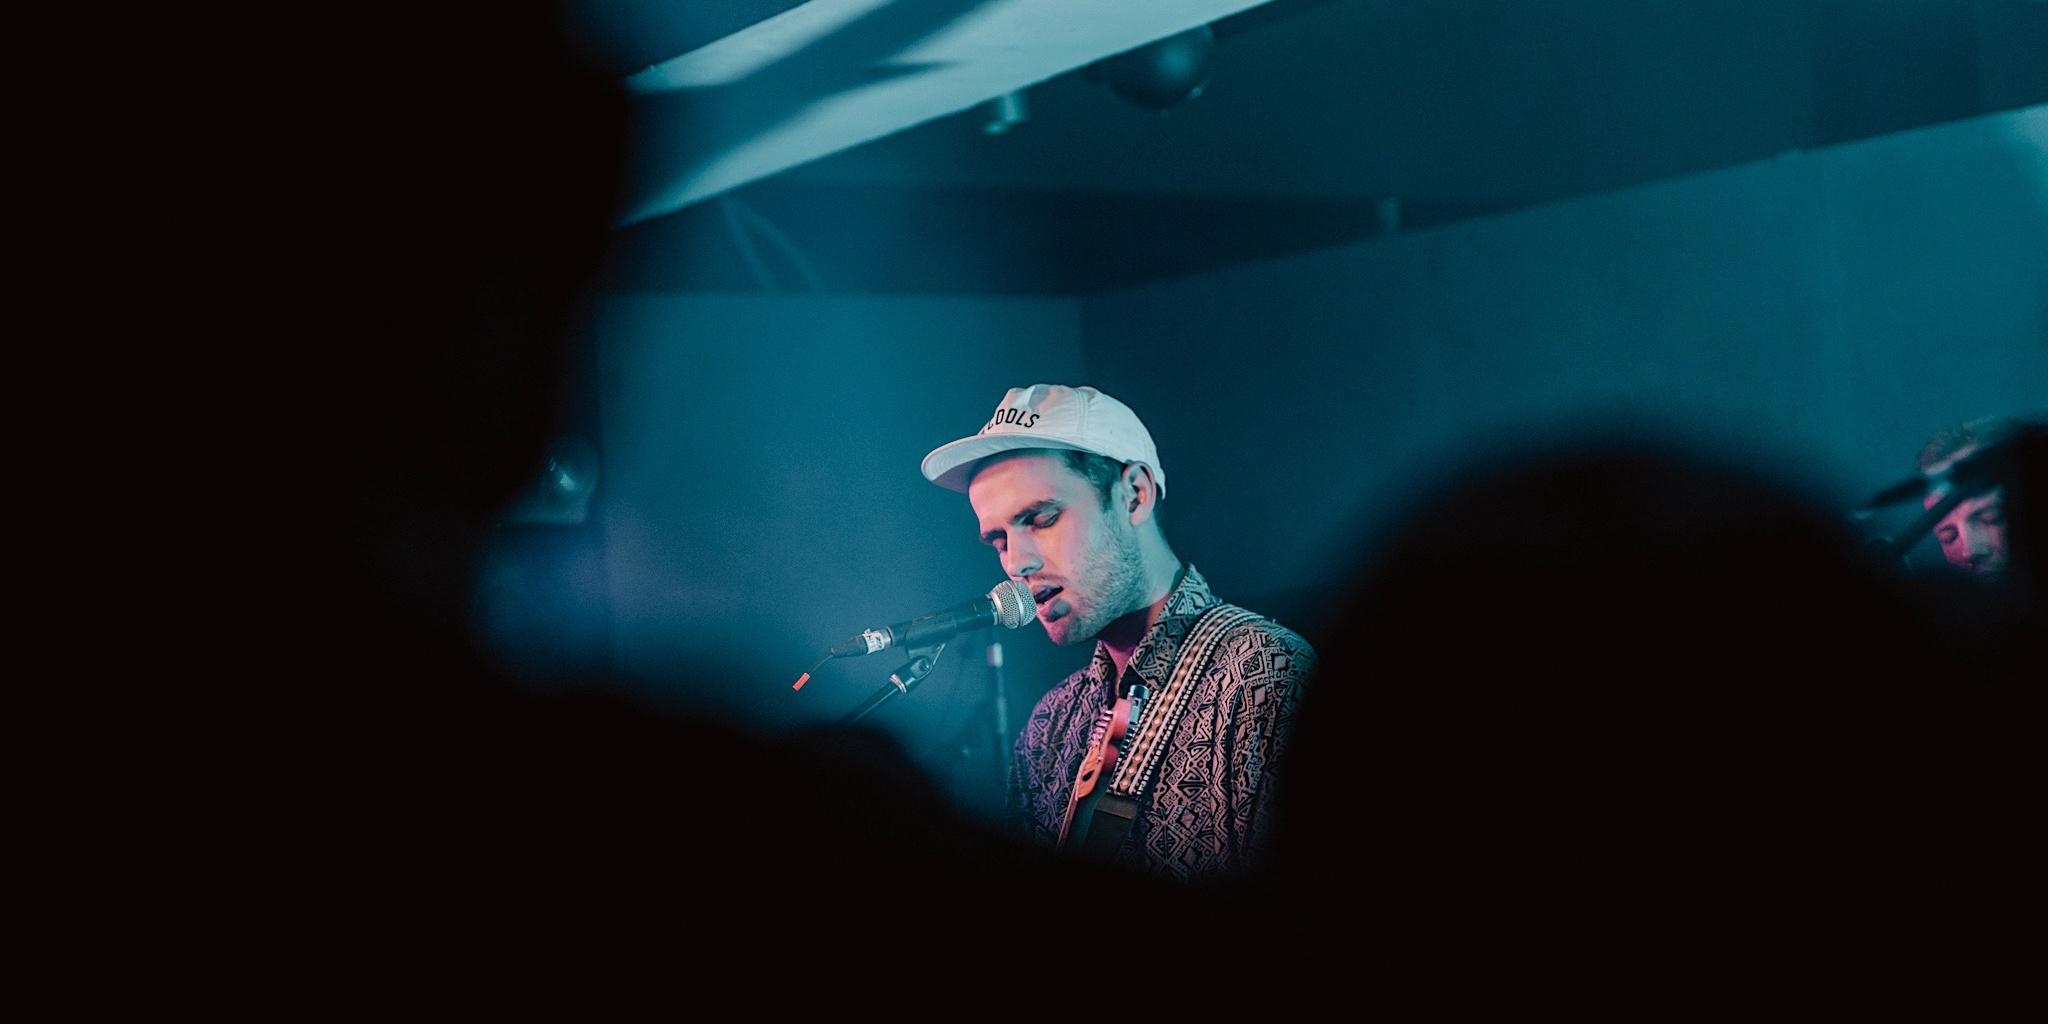 He is the Sorcerer: The power of Jordan Rakei's lo-fi funk in Singapore — gig report